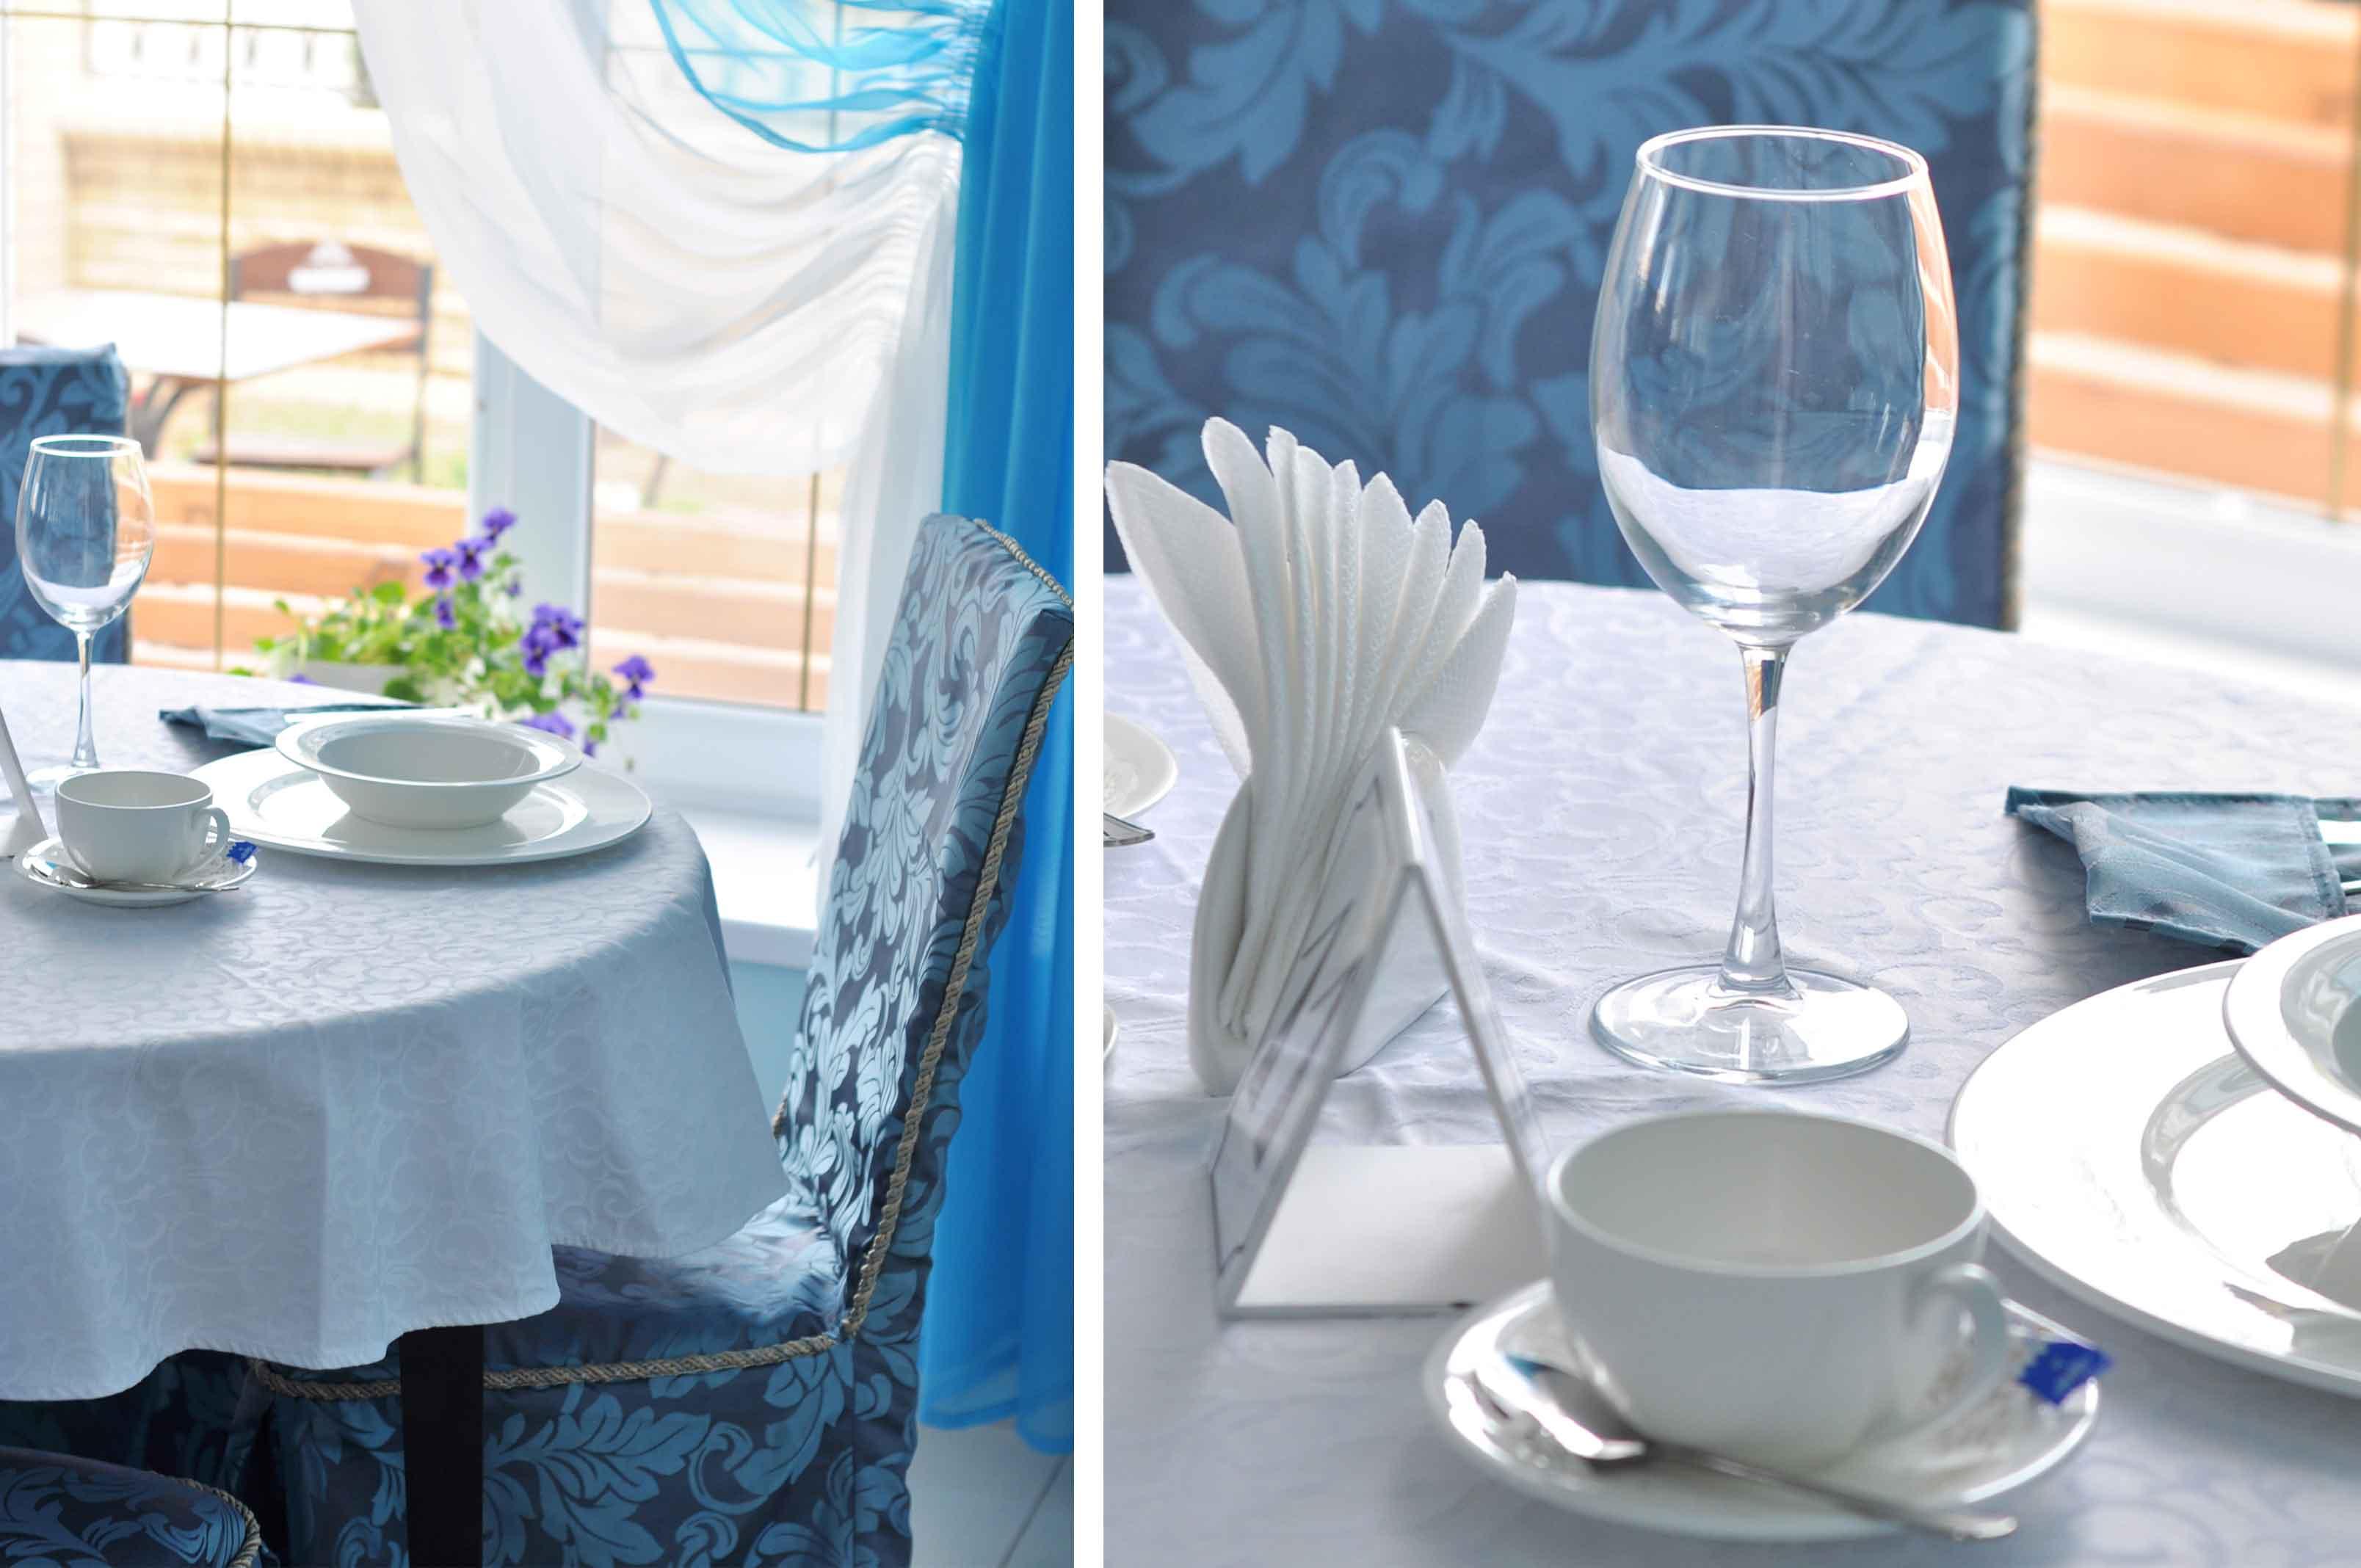 afina-hotel-restoran-berdjansk-02